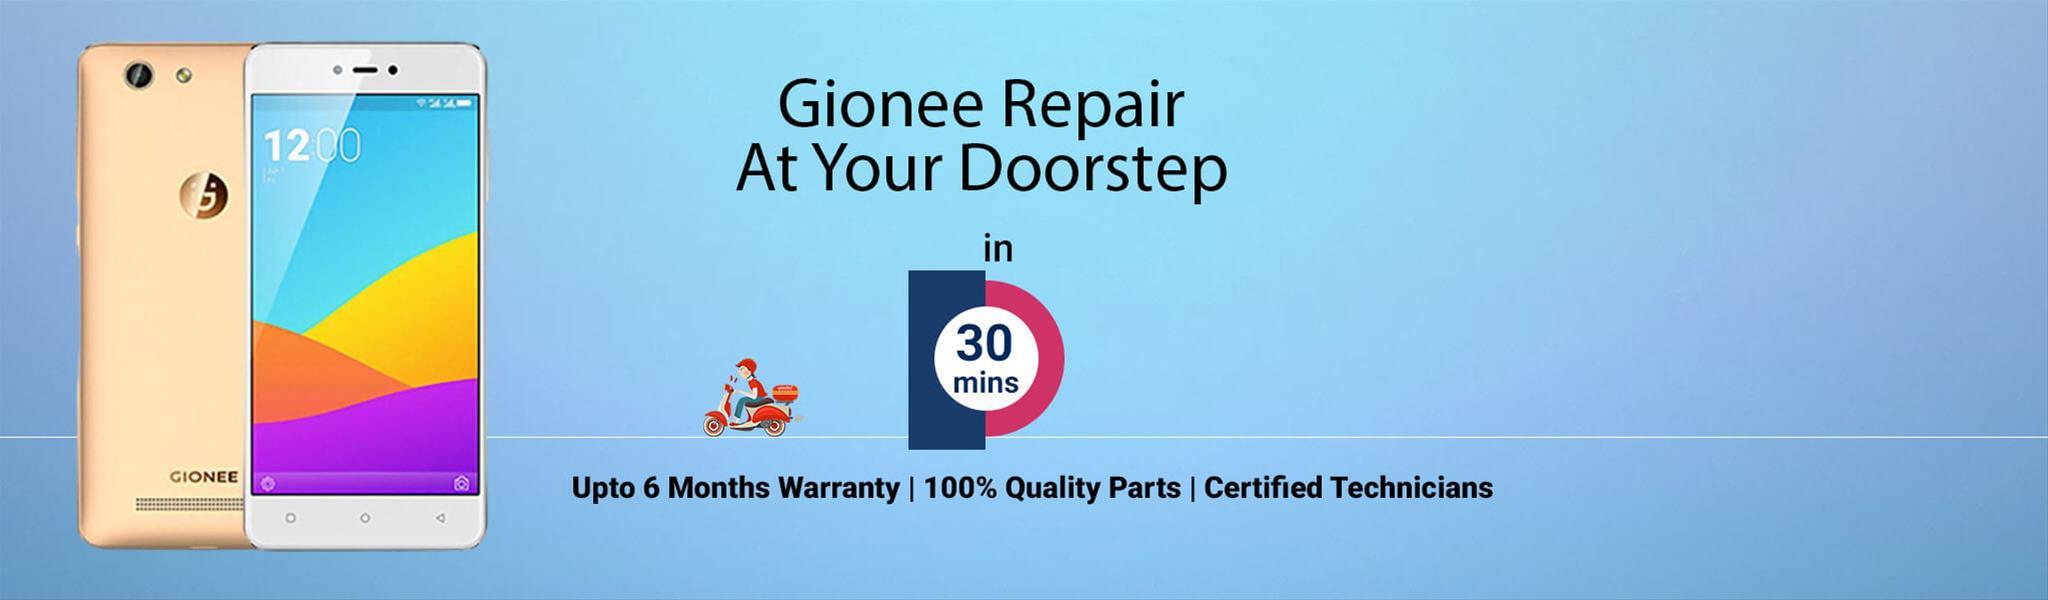 gionee-repair-service-banner-delhi.jpg